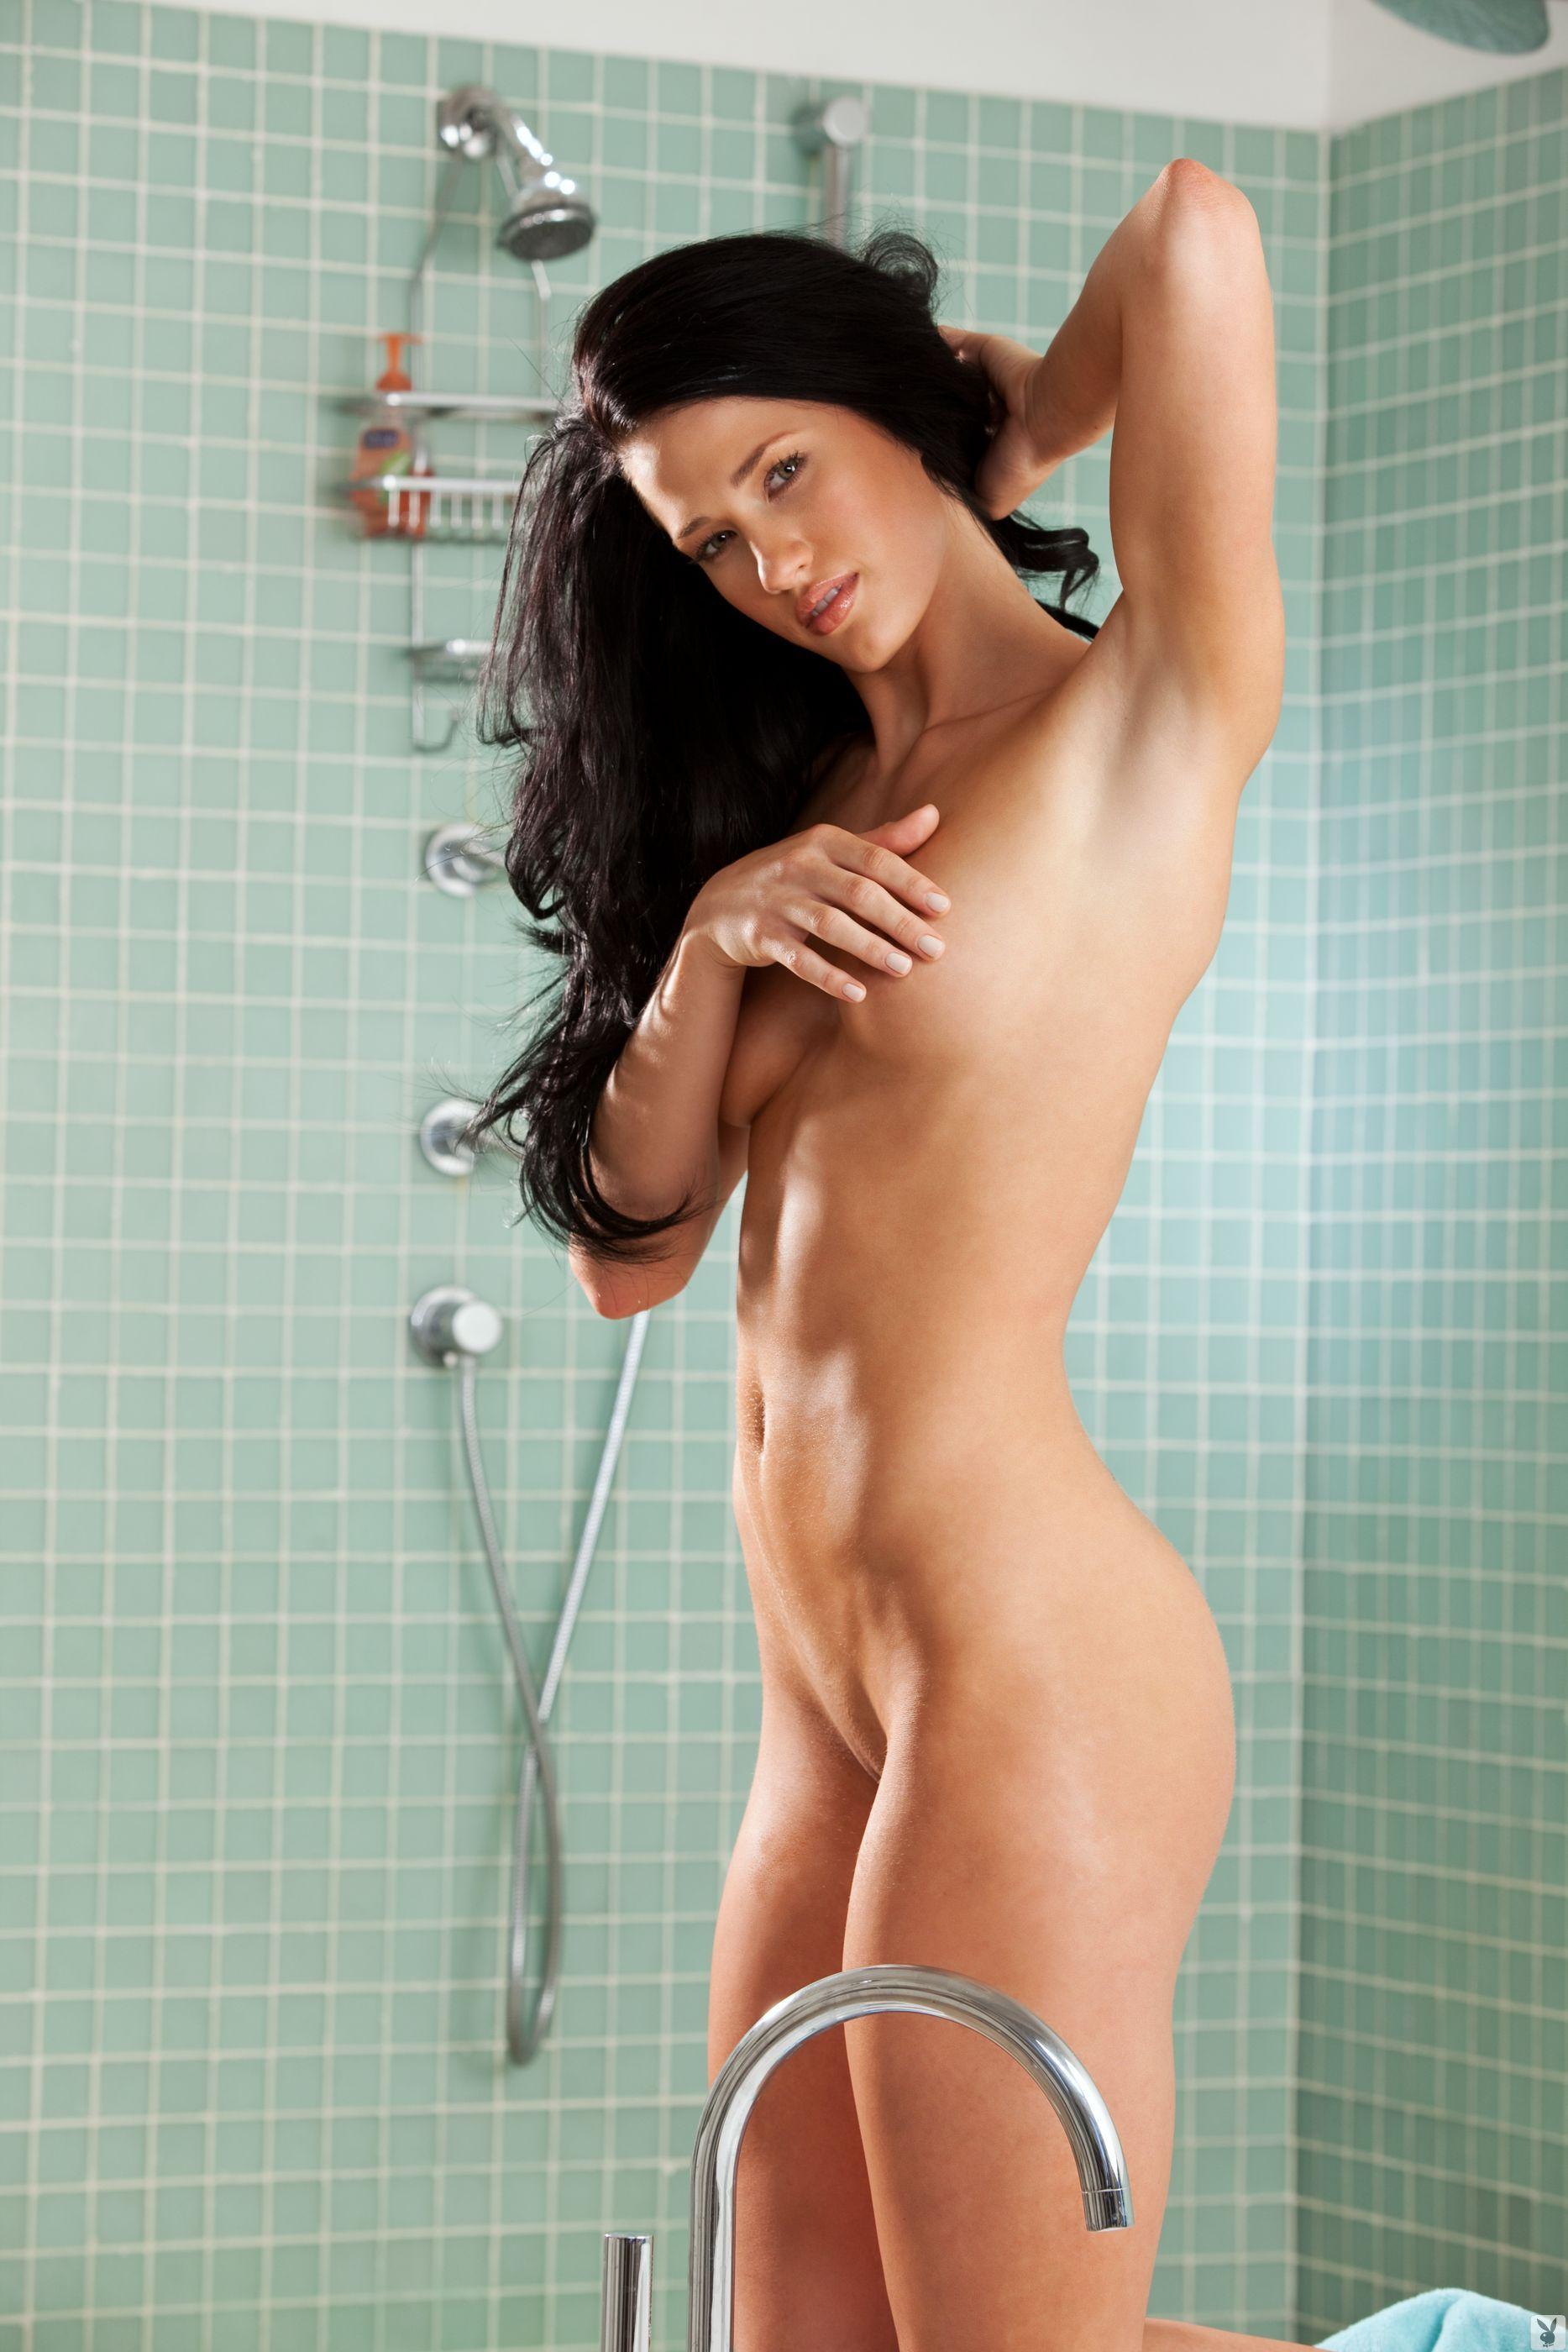 ashton-winters-brunette-nude-bathroom-playboy-07